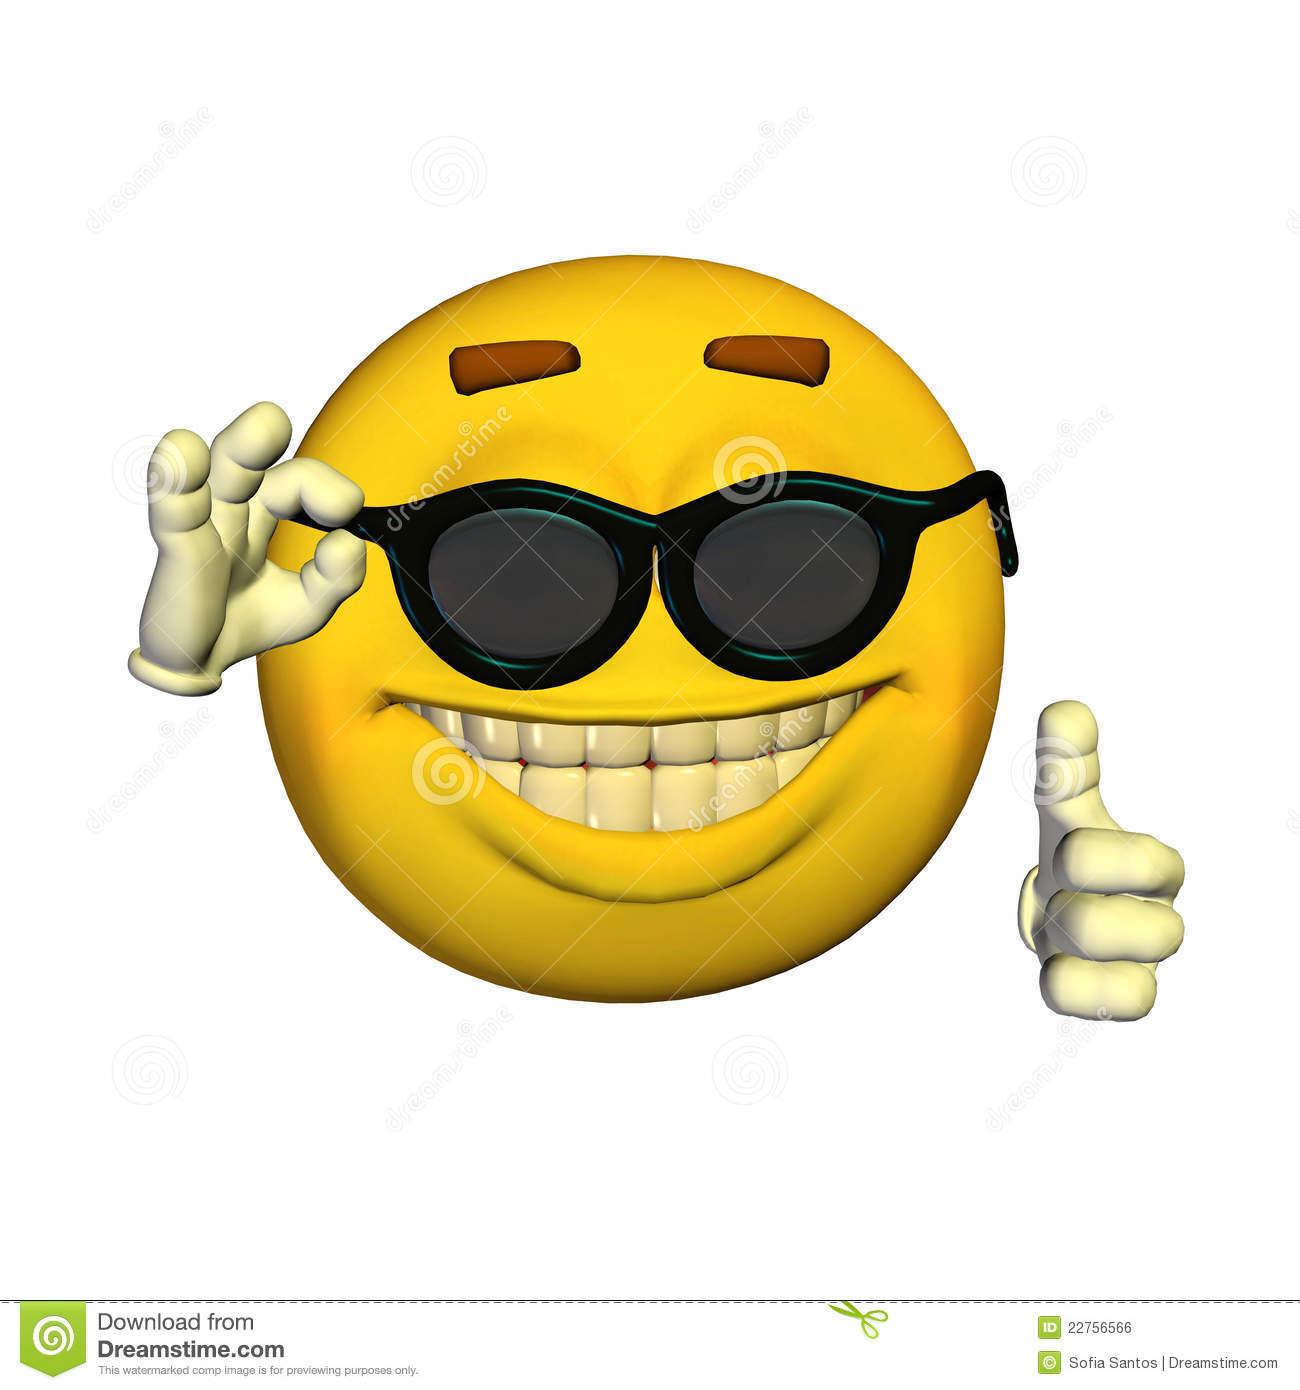 Emoticon - Sunglasses Stock Illustration-Emoticon - Sunglasses stock illustration. Illustration of expression -  22756566-8